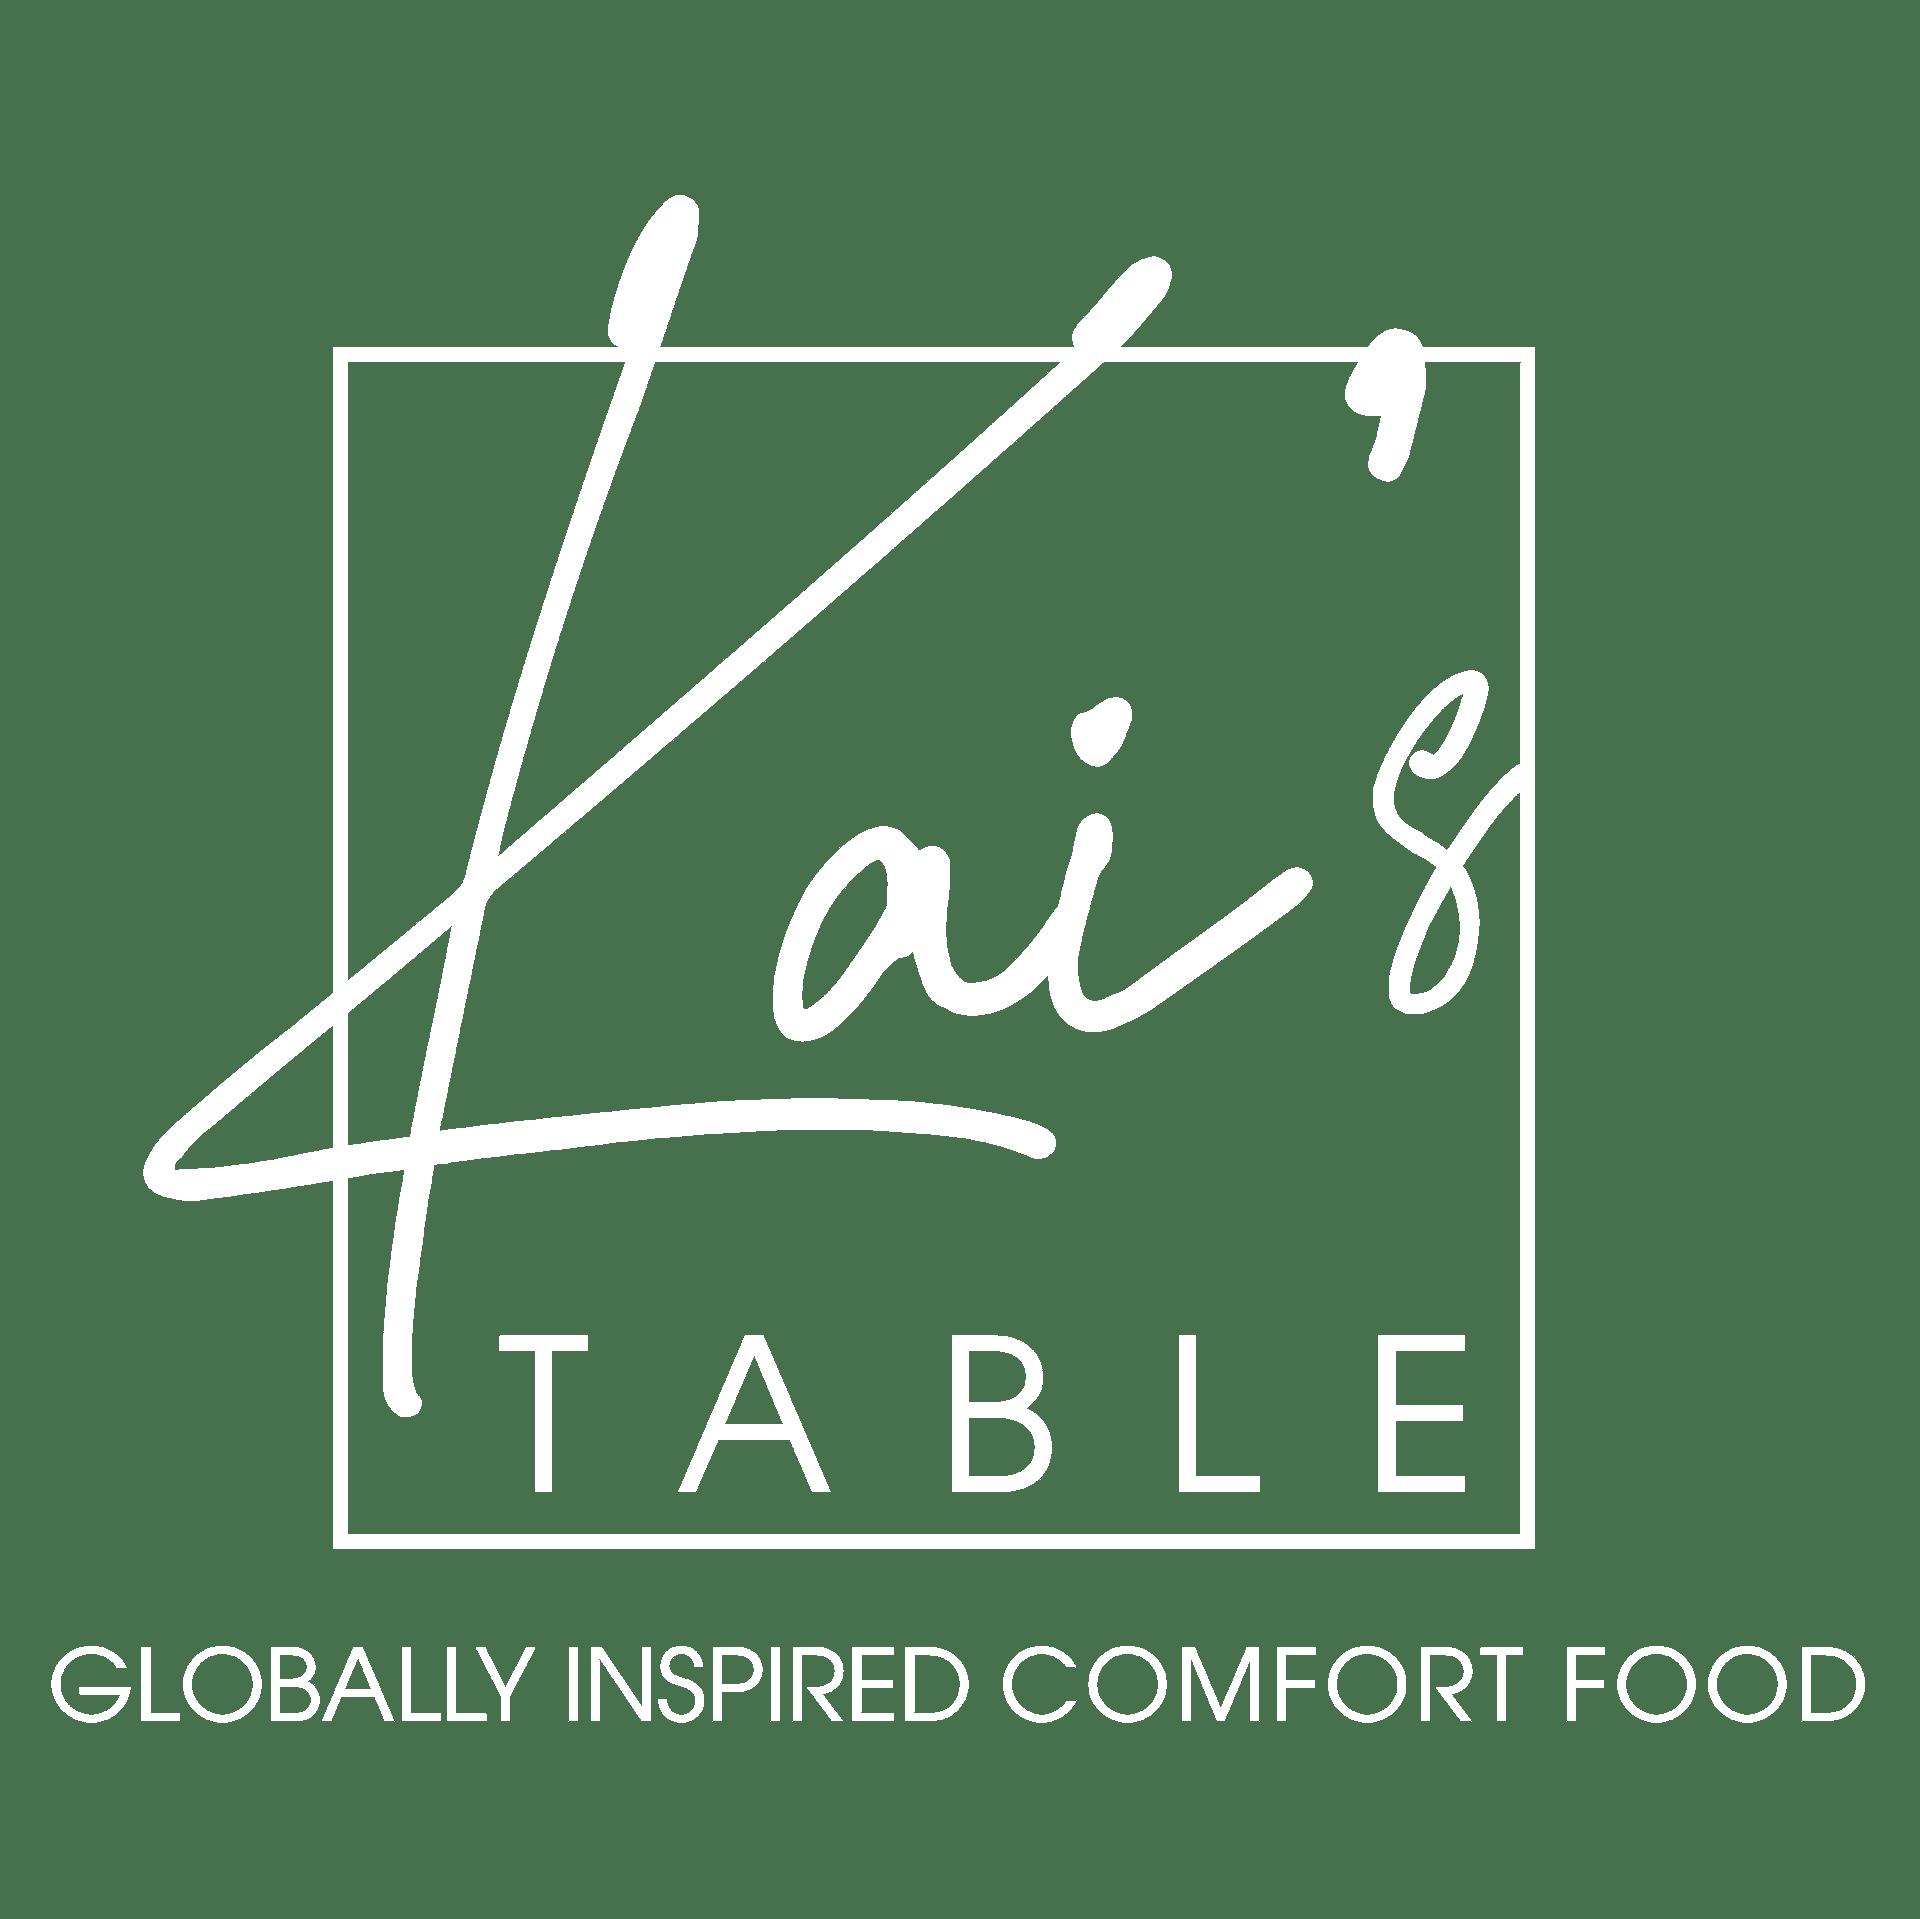 Kai's Table Globally Inspired Comfort Food